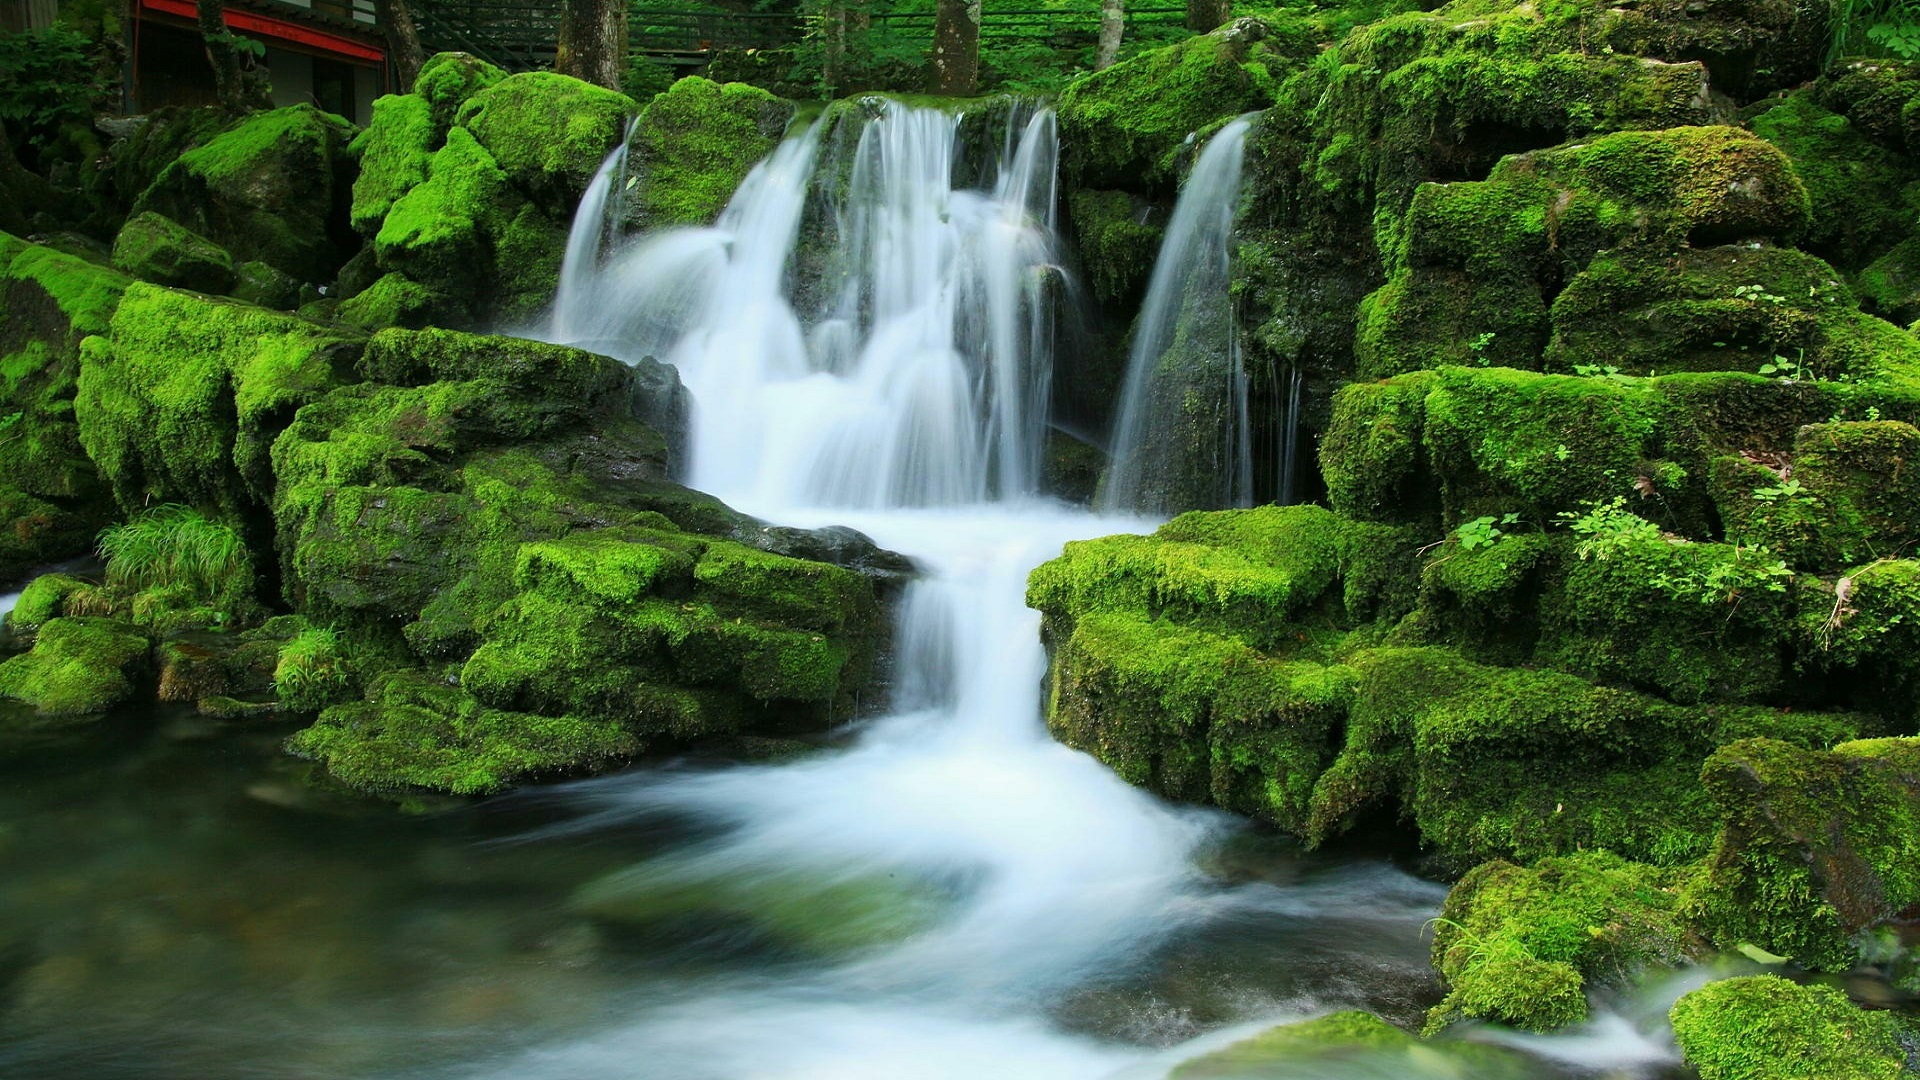 Waterfall-wallpapers-free-hd-for-desktop